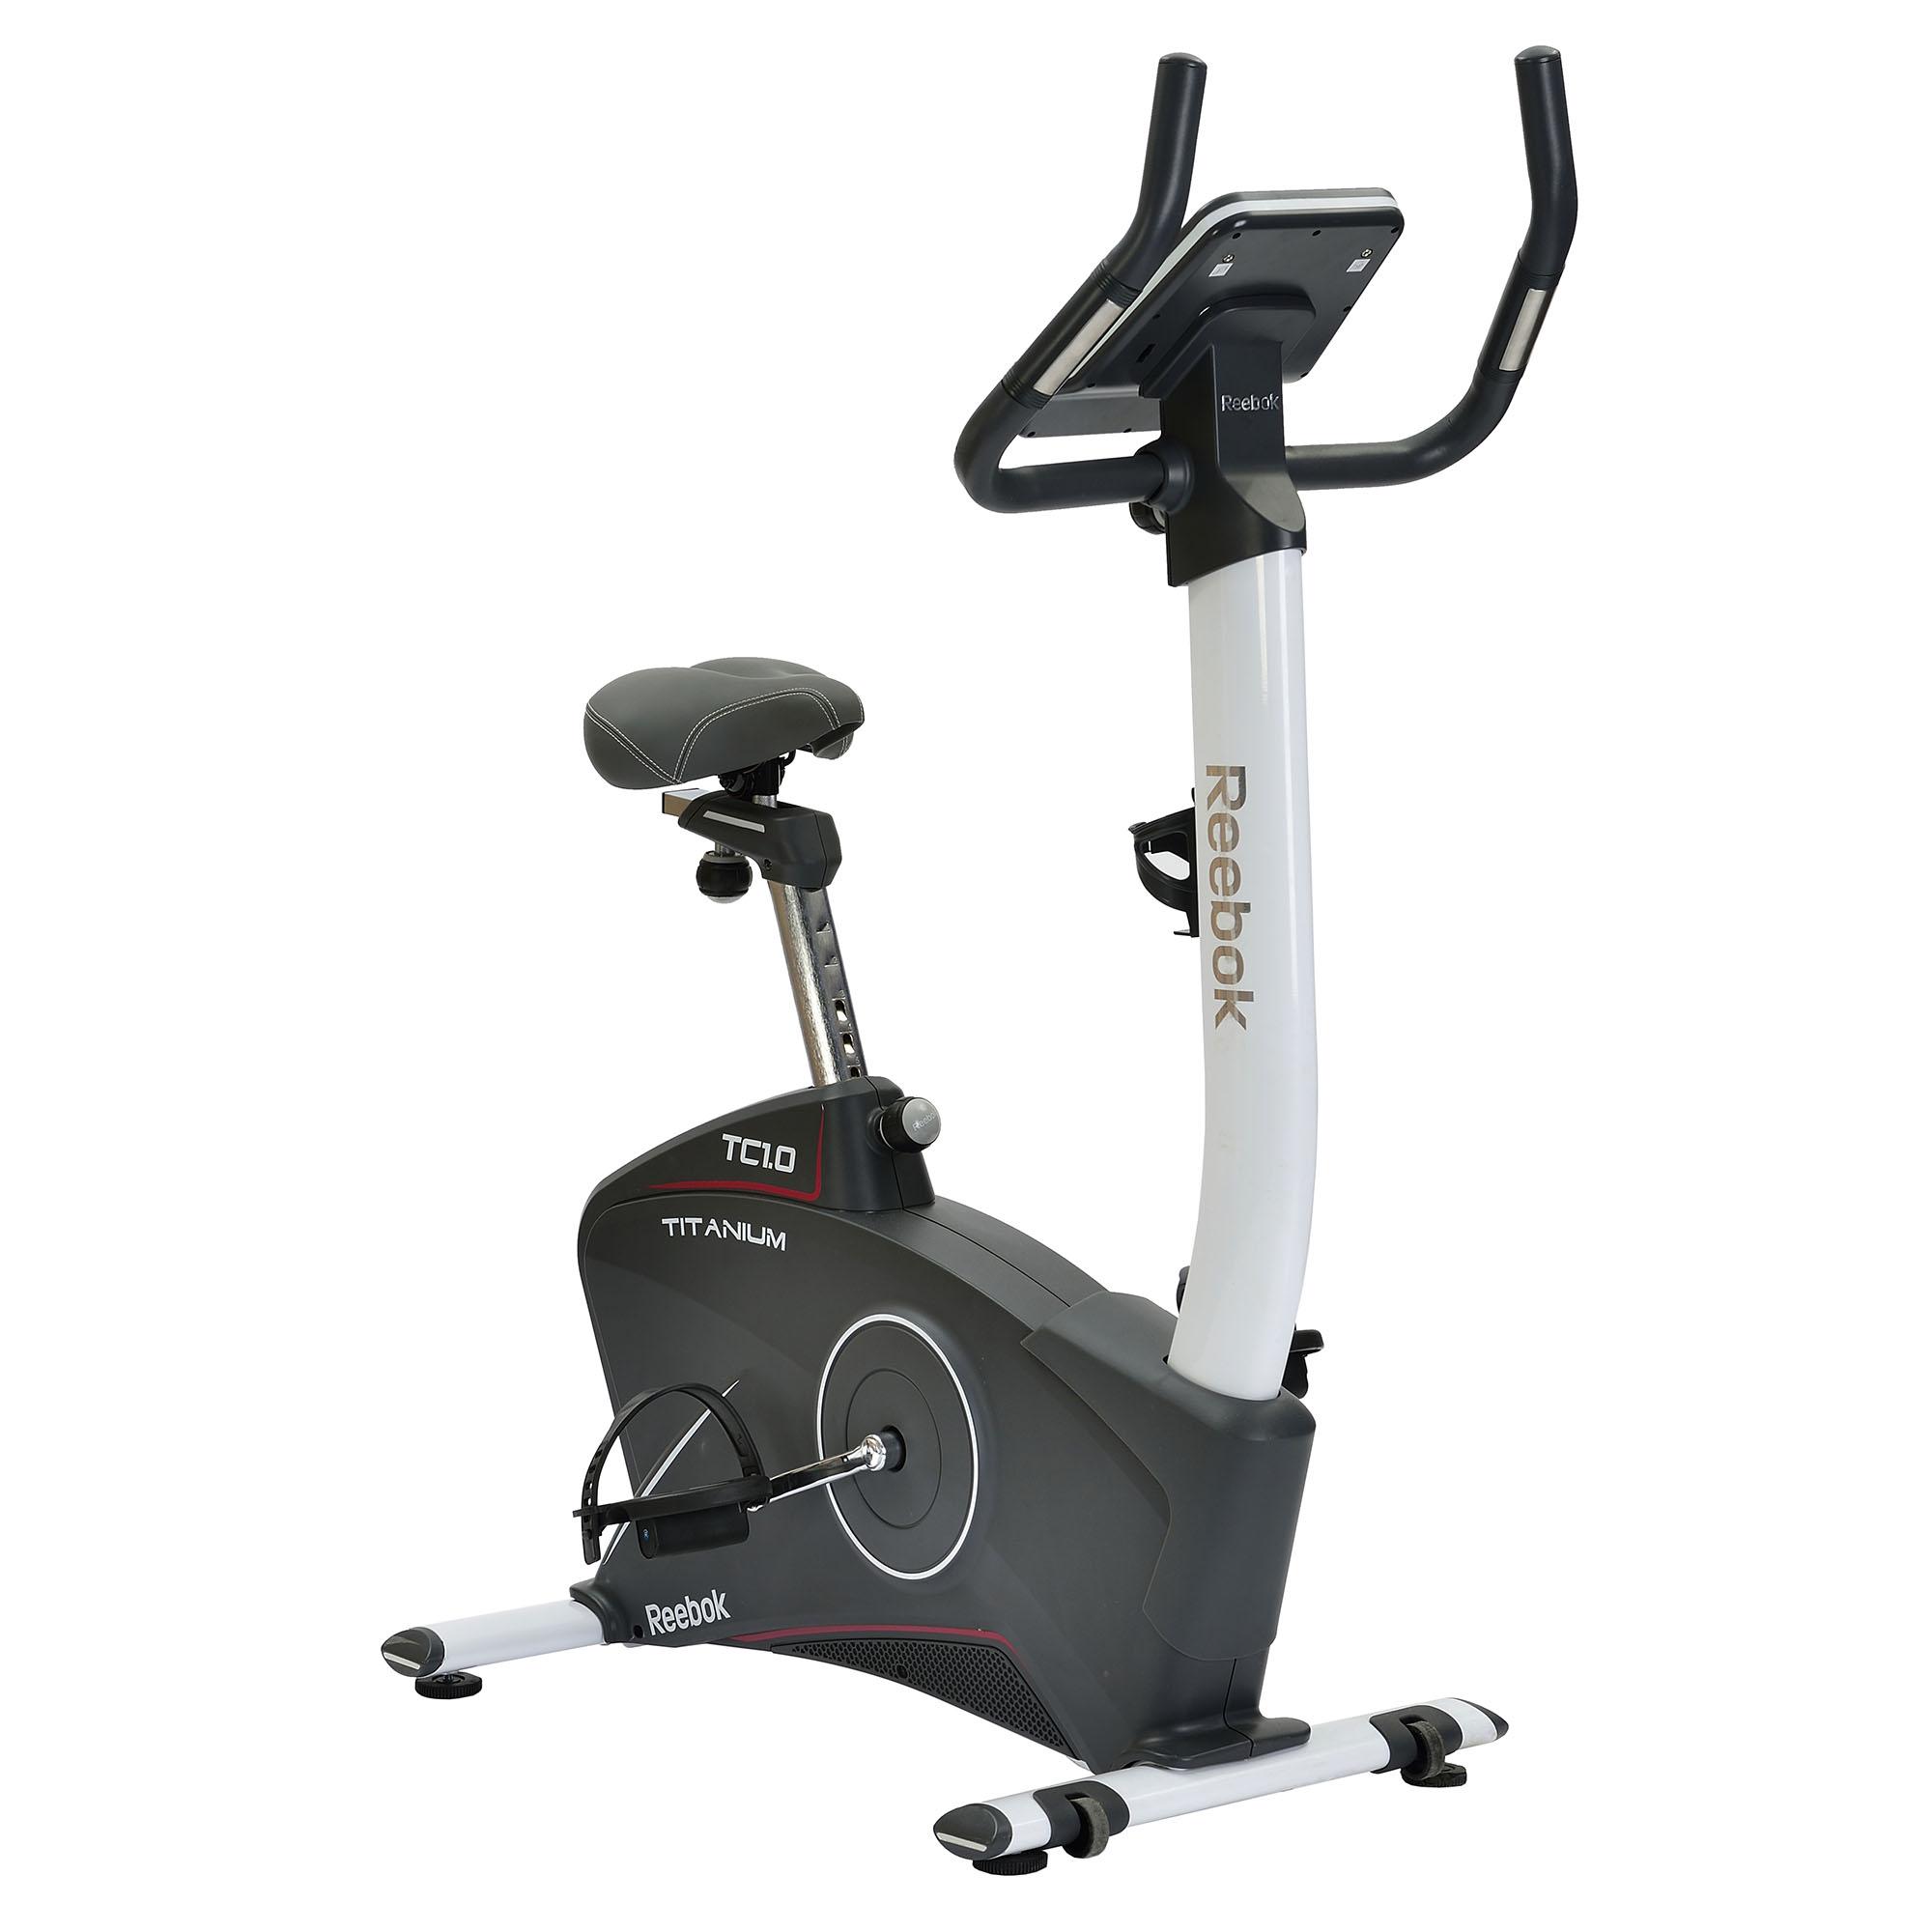 Reebok Titanium TC1.0 Exercise Bike